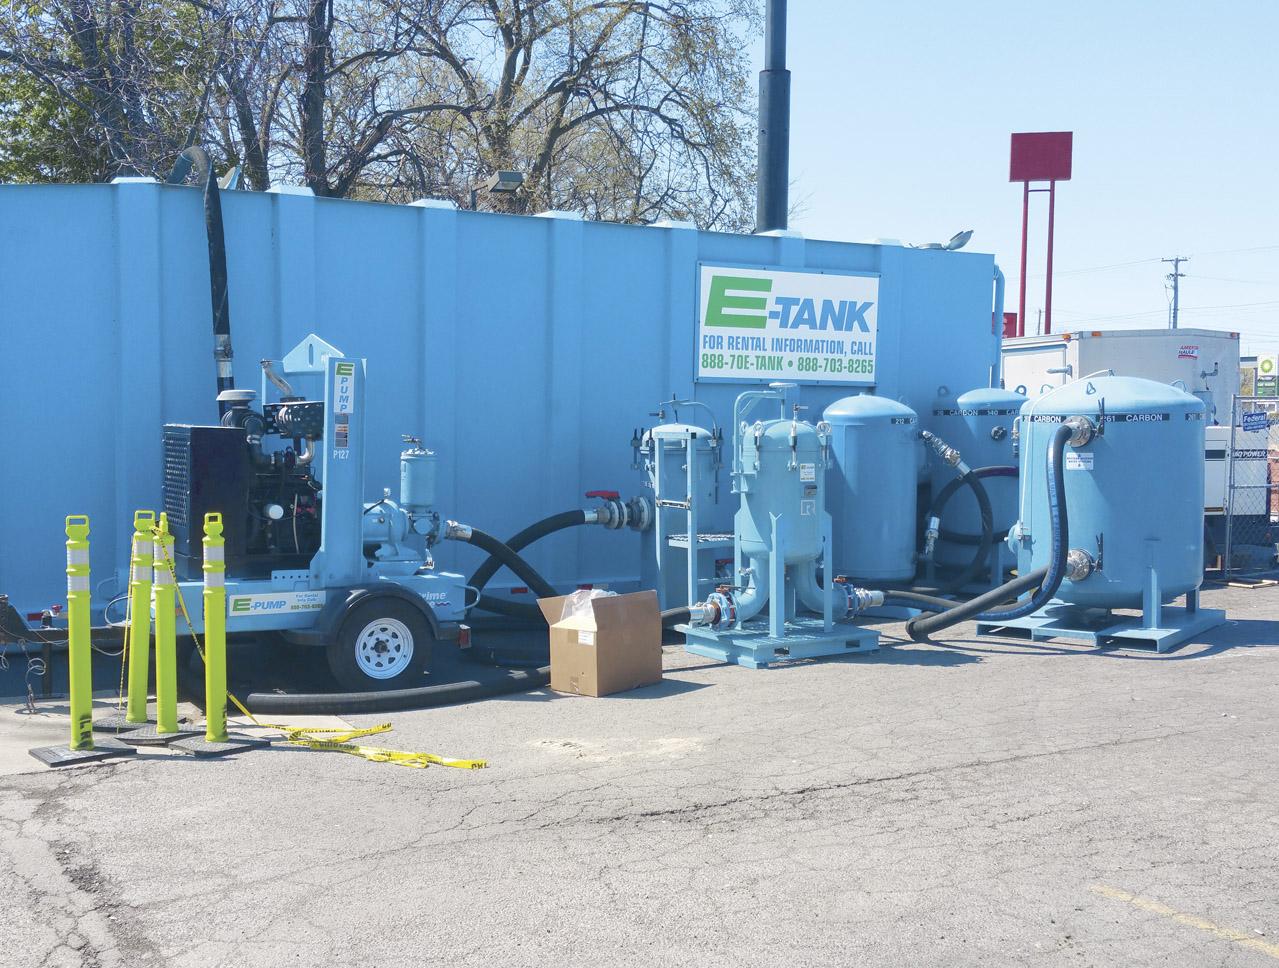 Gas Station Replaces Underground Storage Tanks | E-Tank